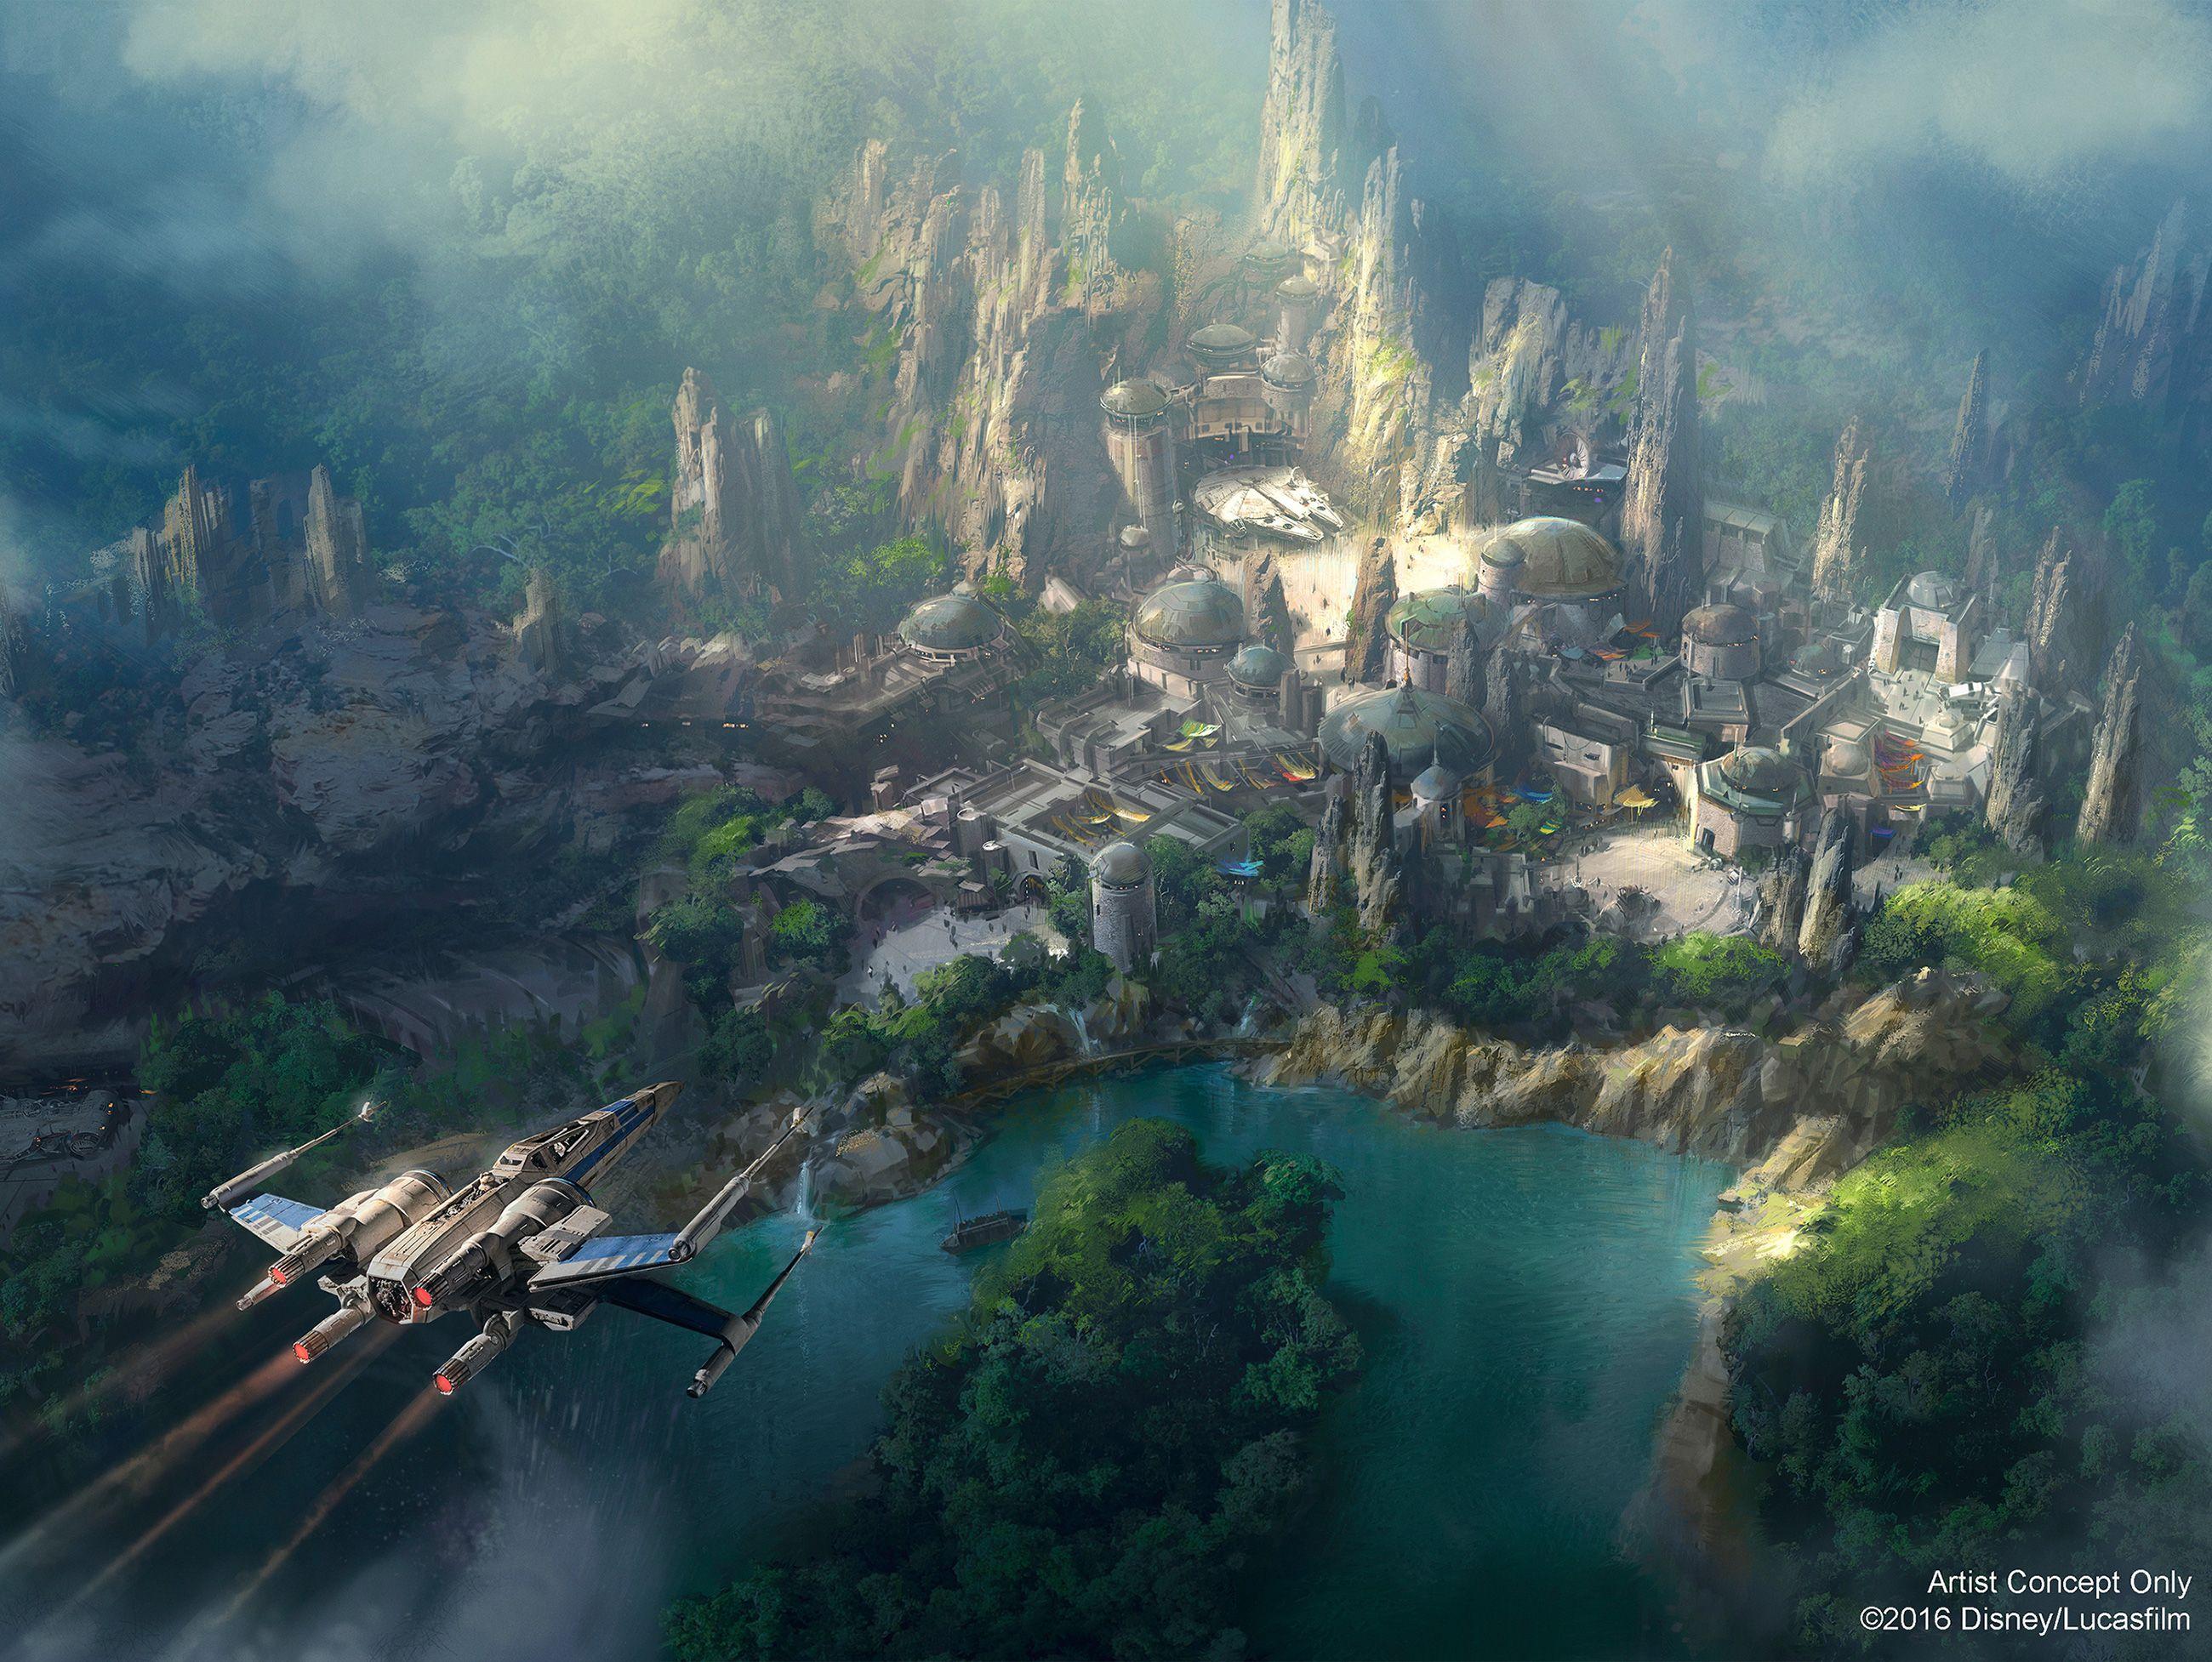 Star Wars Land Walt Disney World